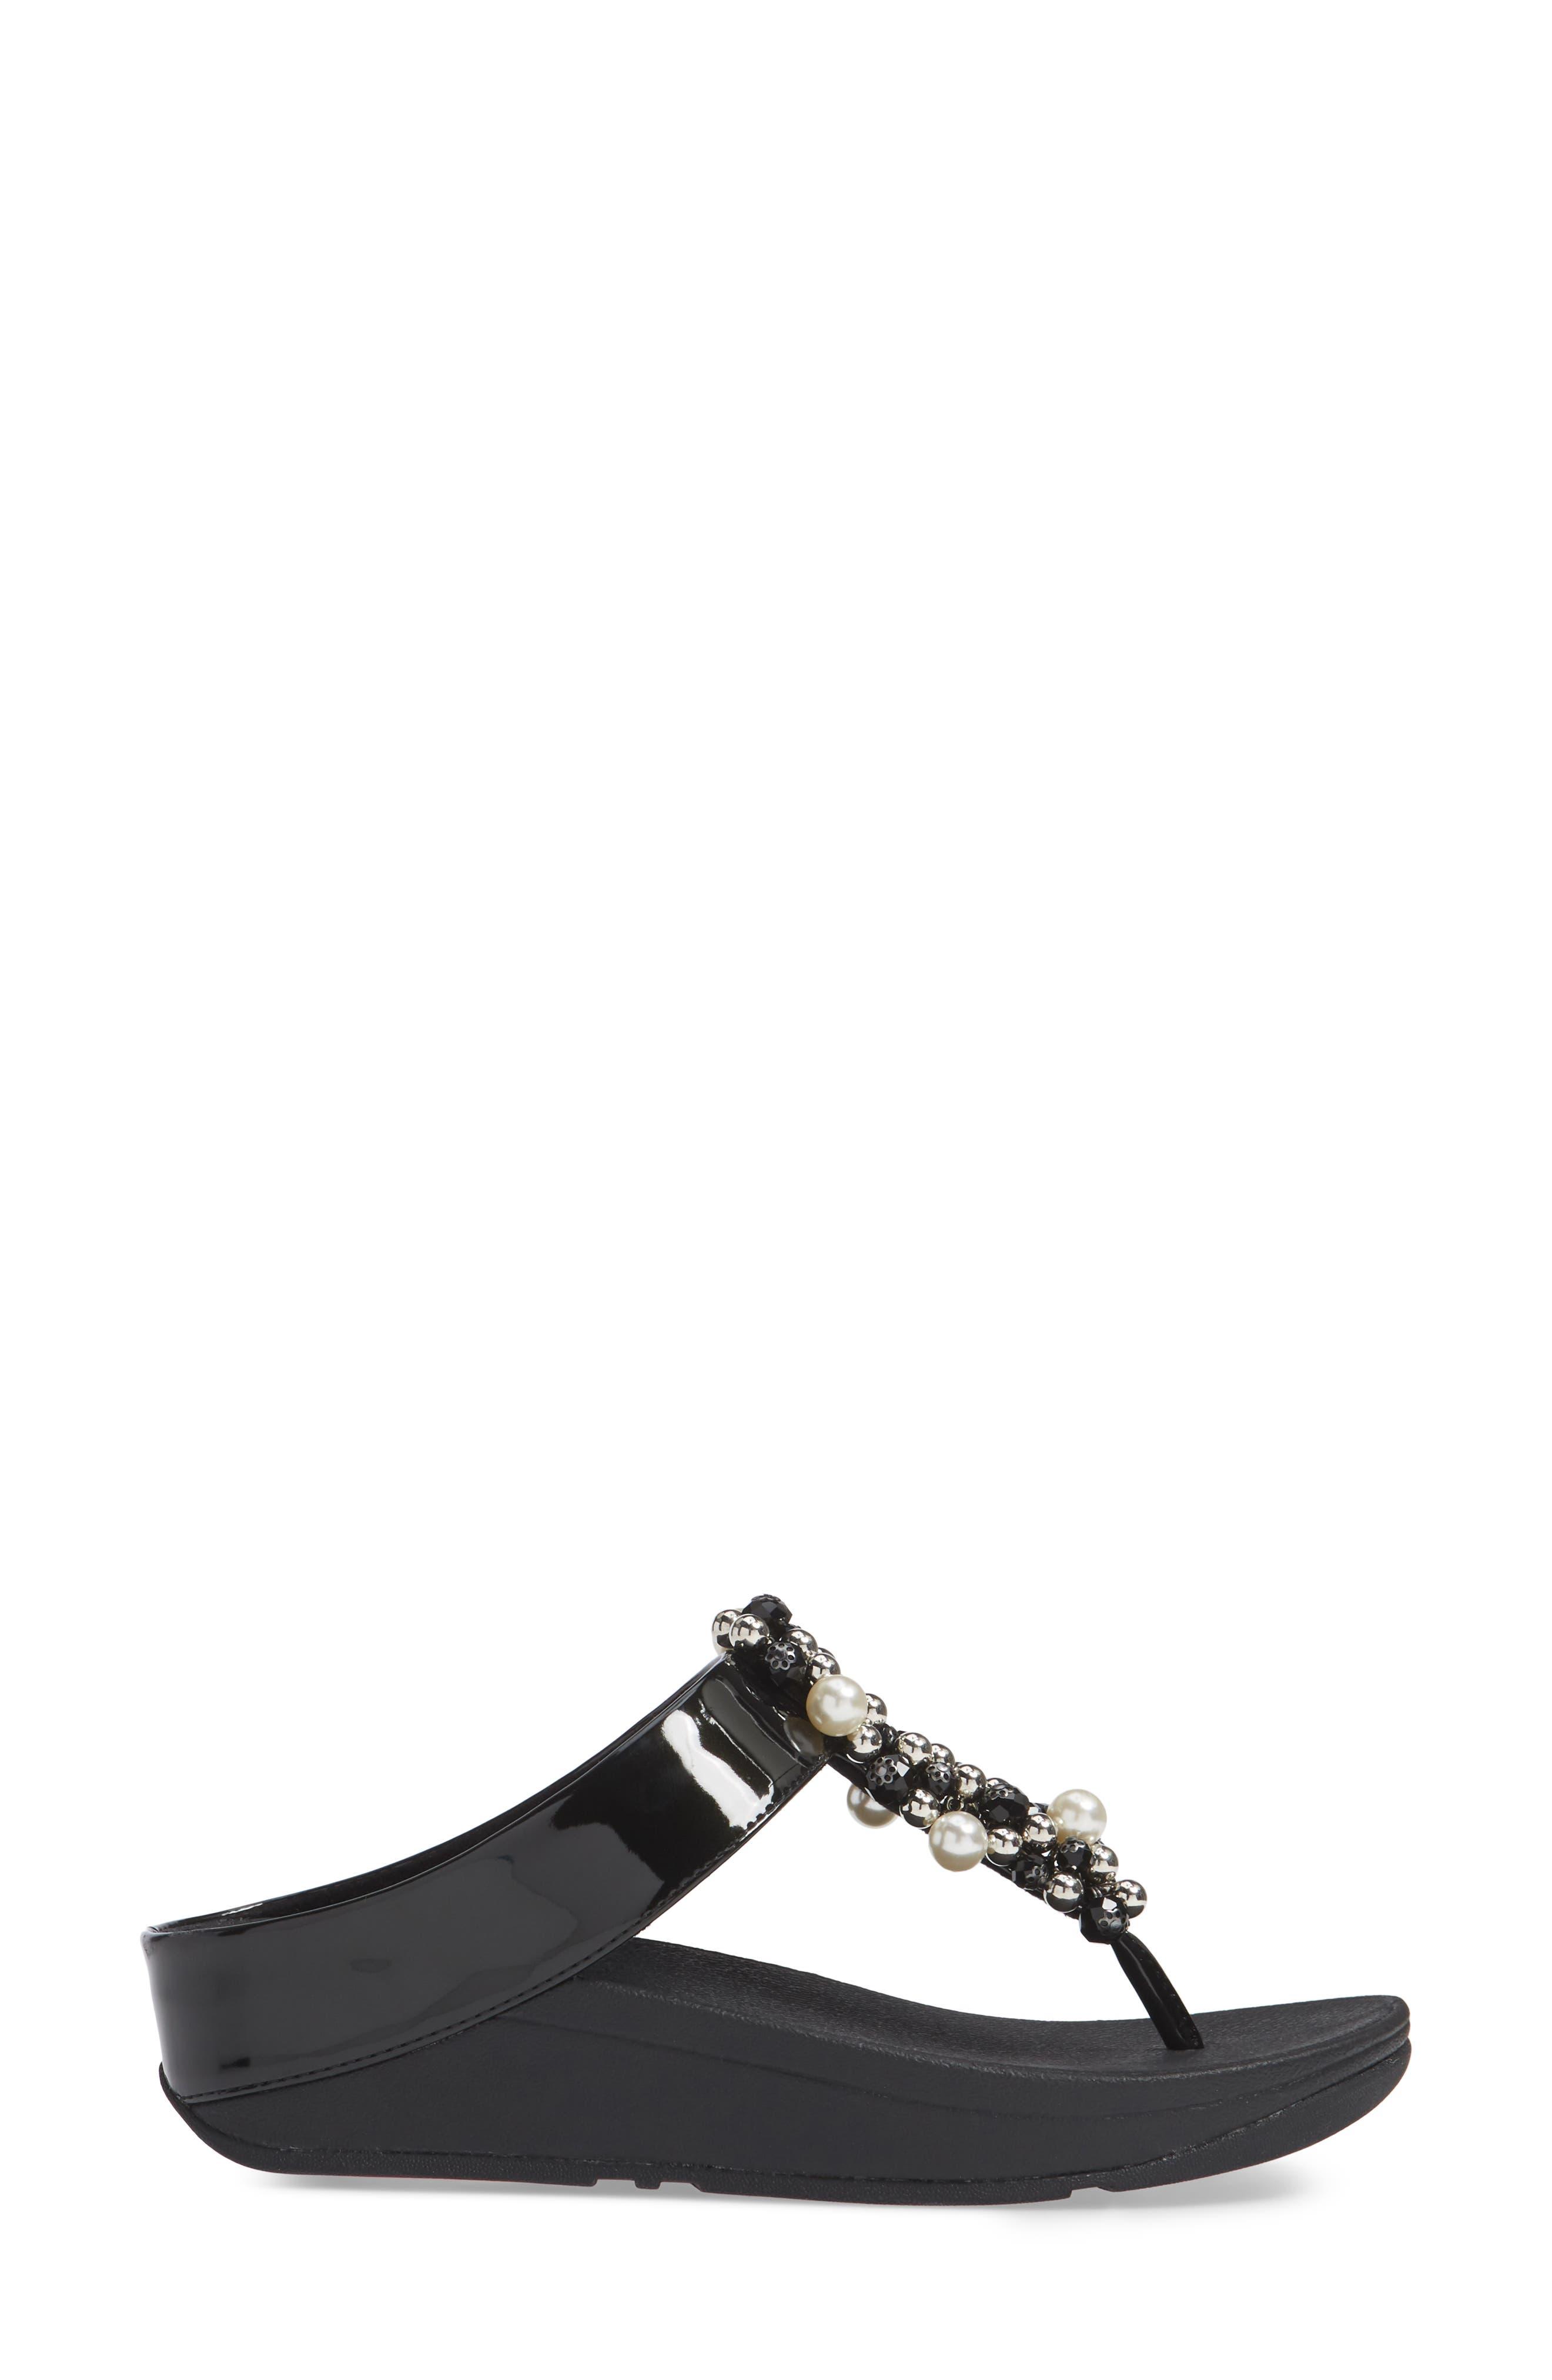 FITFLOP, Deco Embellished Flip Flop, Alternate thumbnail 3, color, BLACK FABRIC